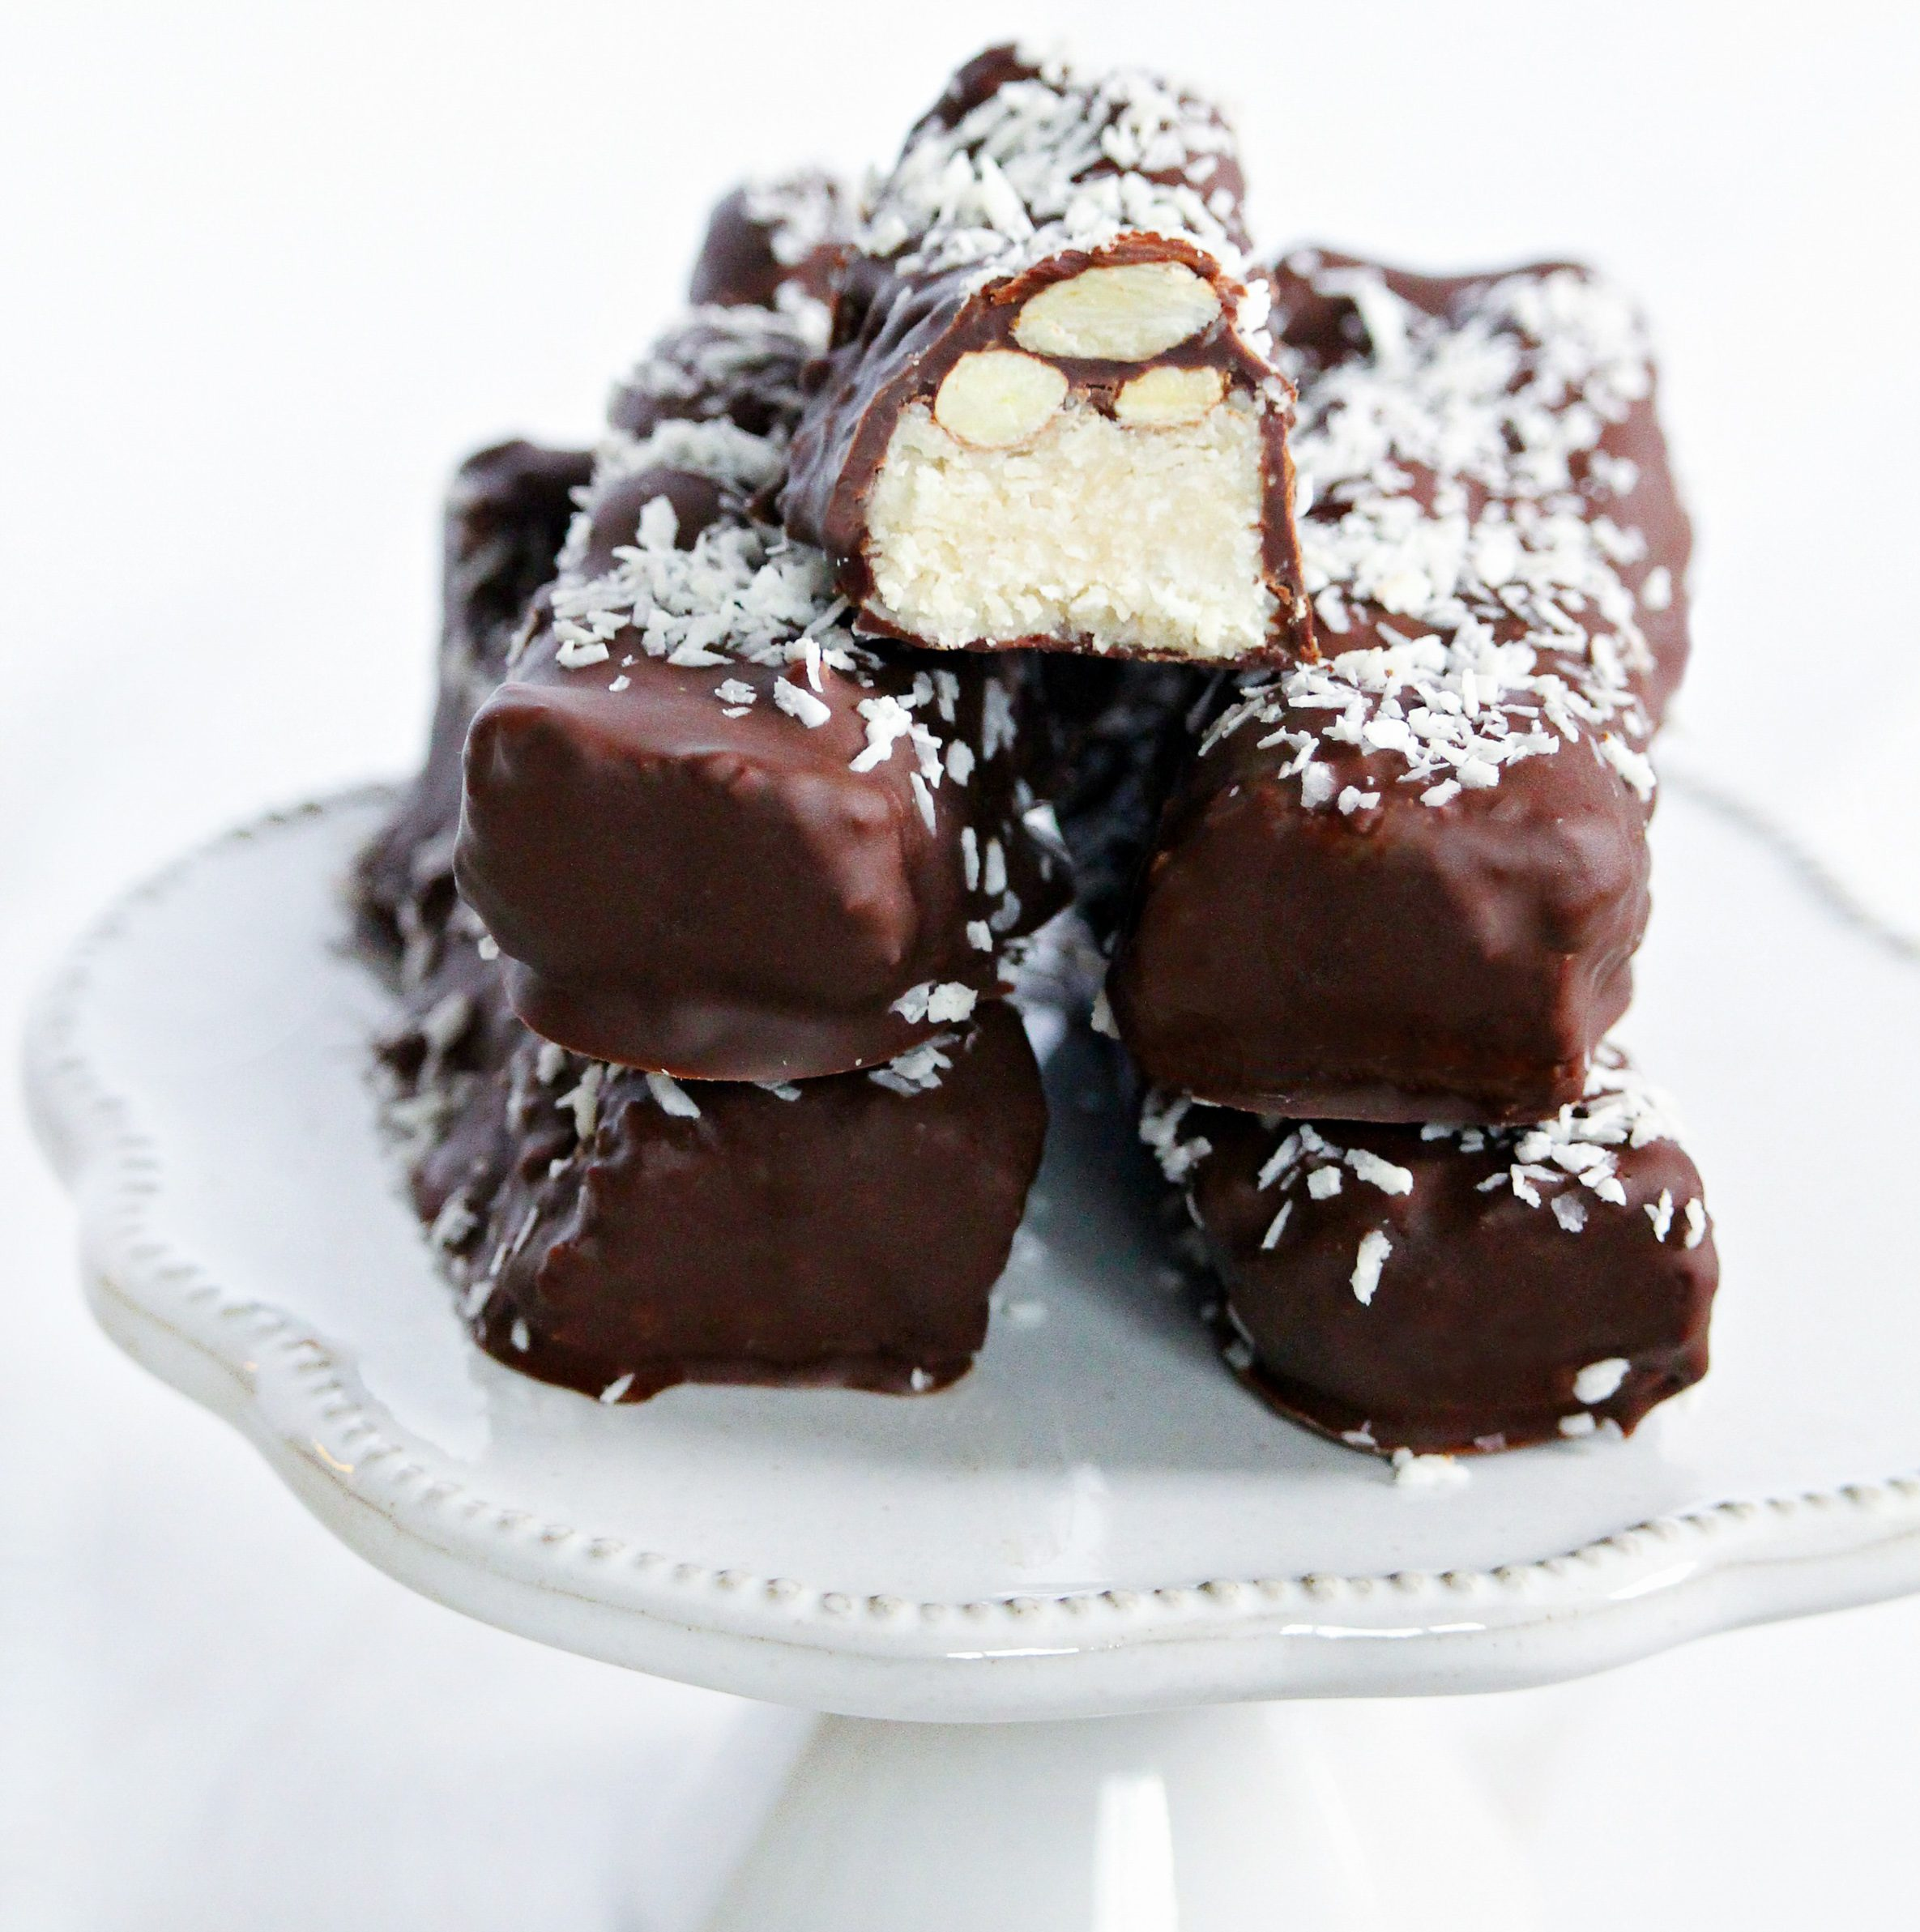 vegan, gluten-free and refined sugar-free almond joy bars